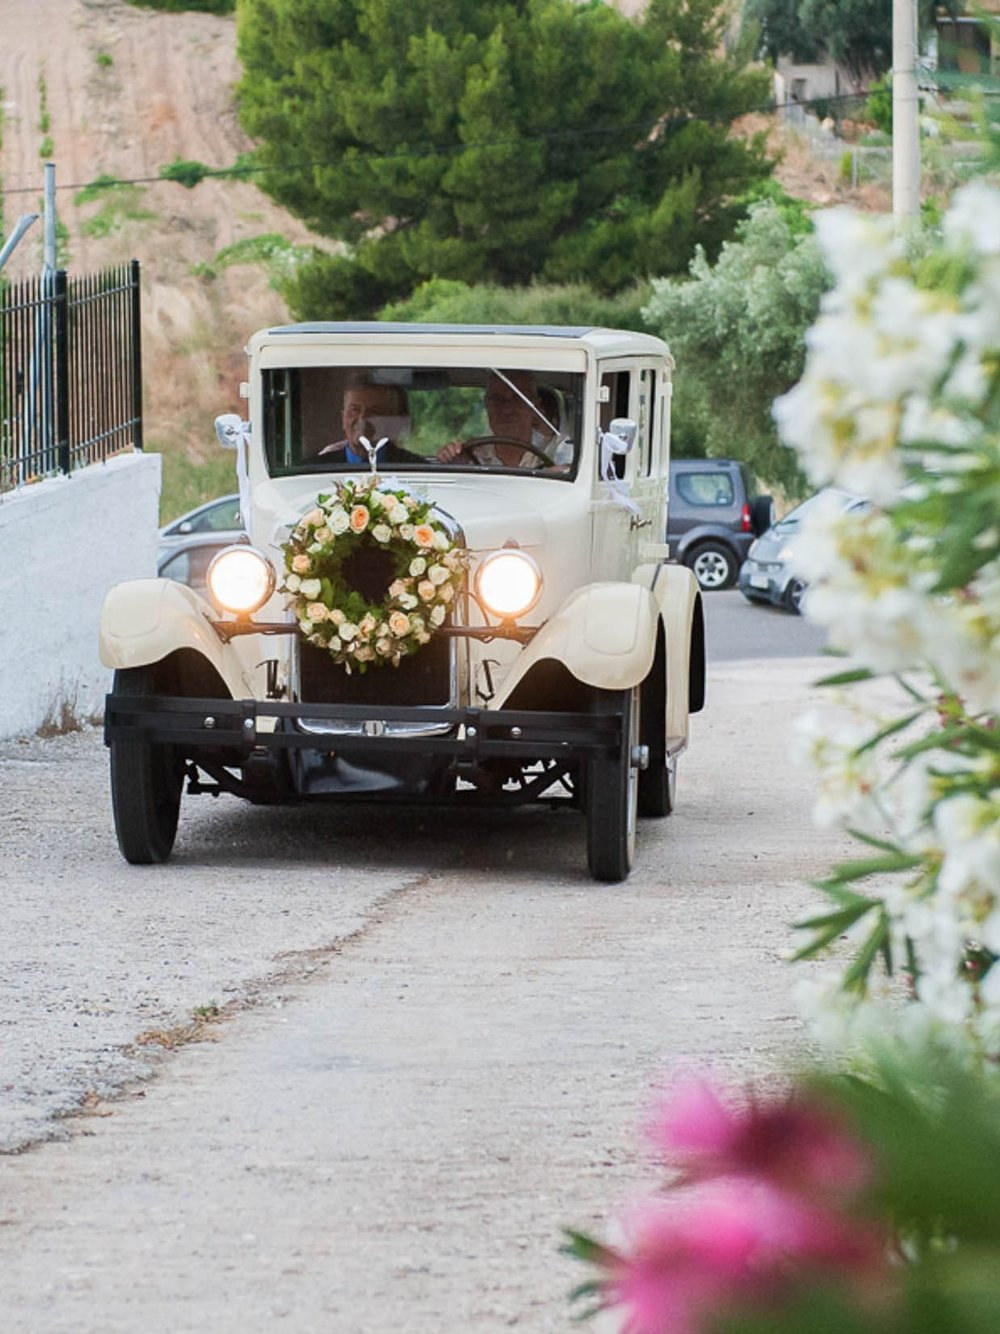 CONSTANTINE & FRANK - Vintage γάμος στο Κτημα Χατζή